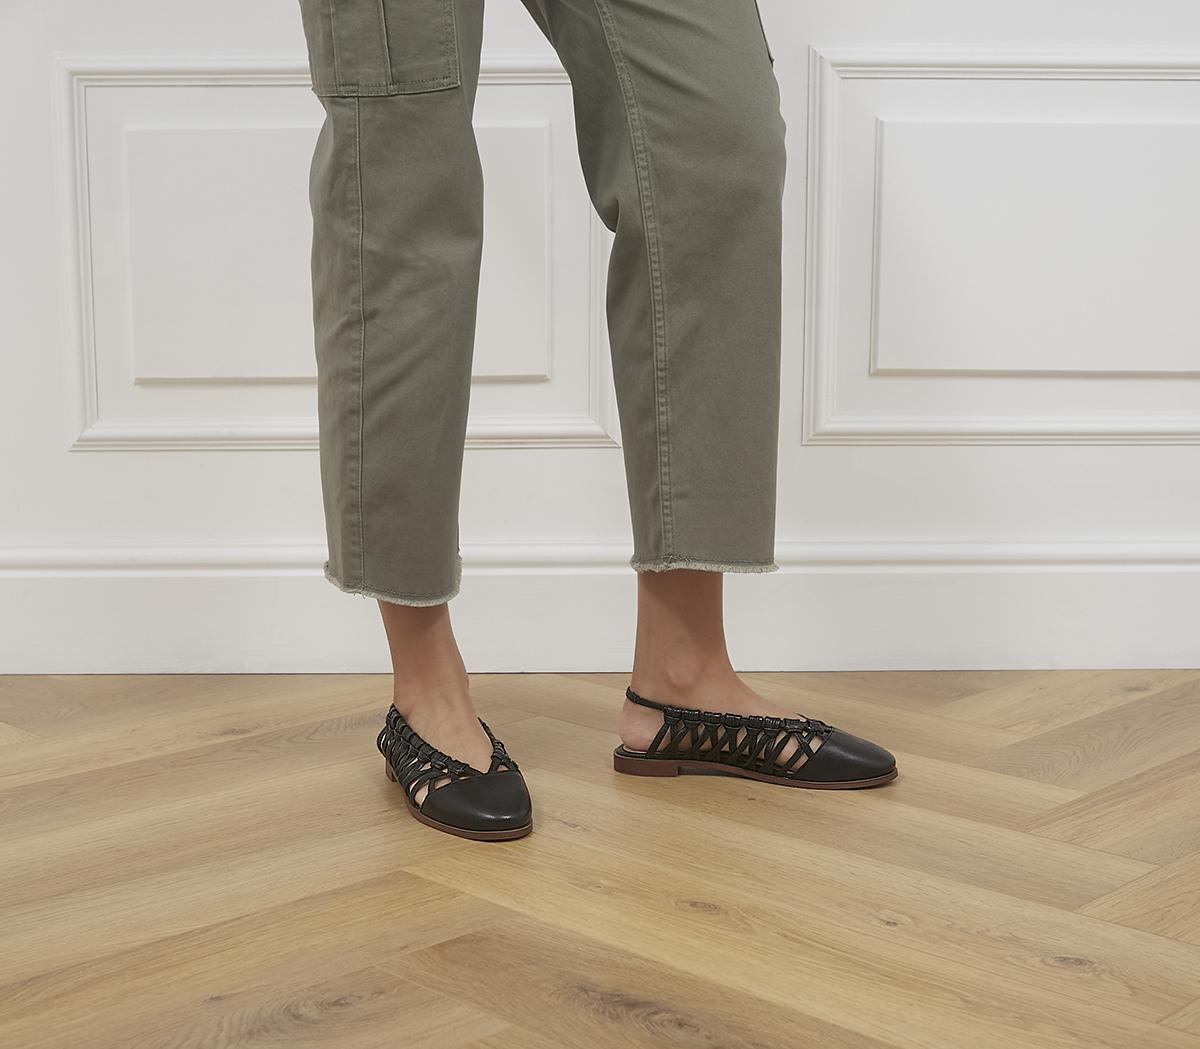 Fazerina Woven Flat Shoes